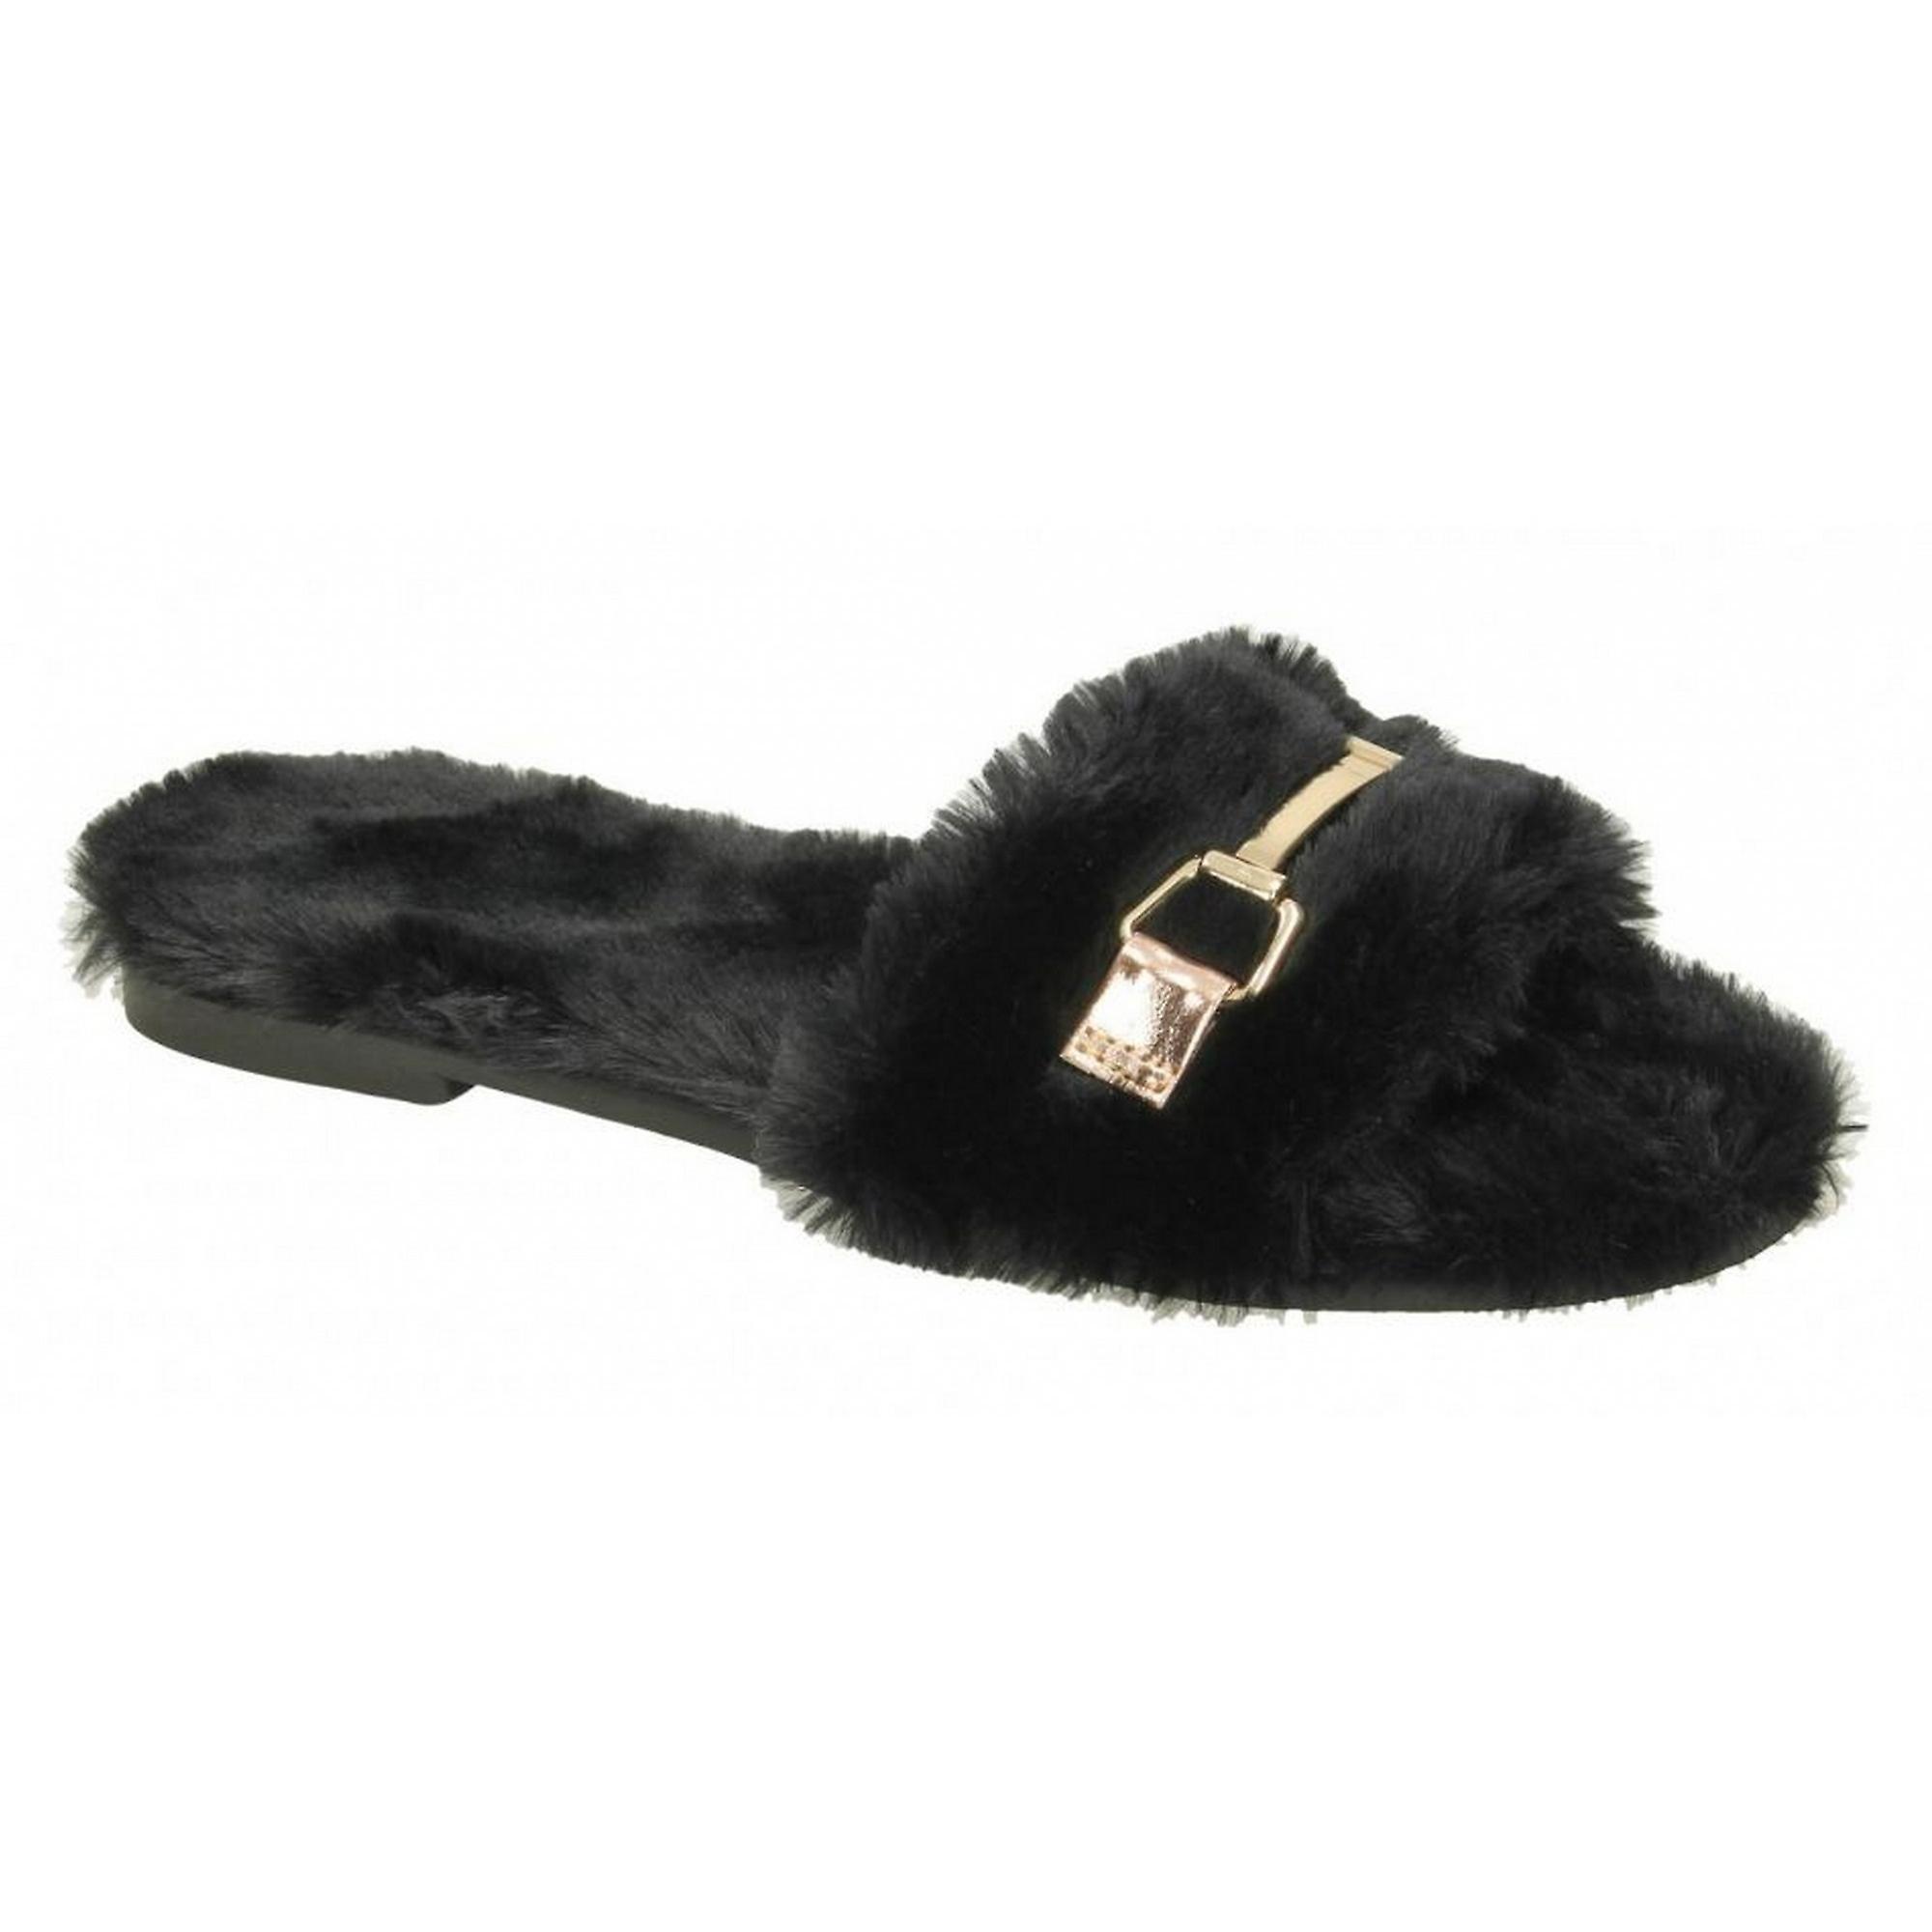 Spot On Womens/ladies Flat Faux Fur Mule Sliders